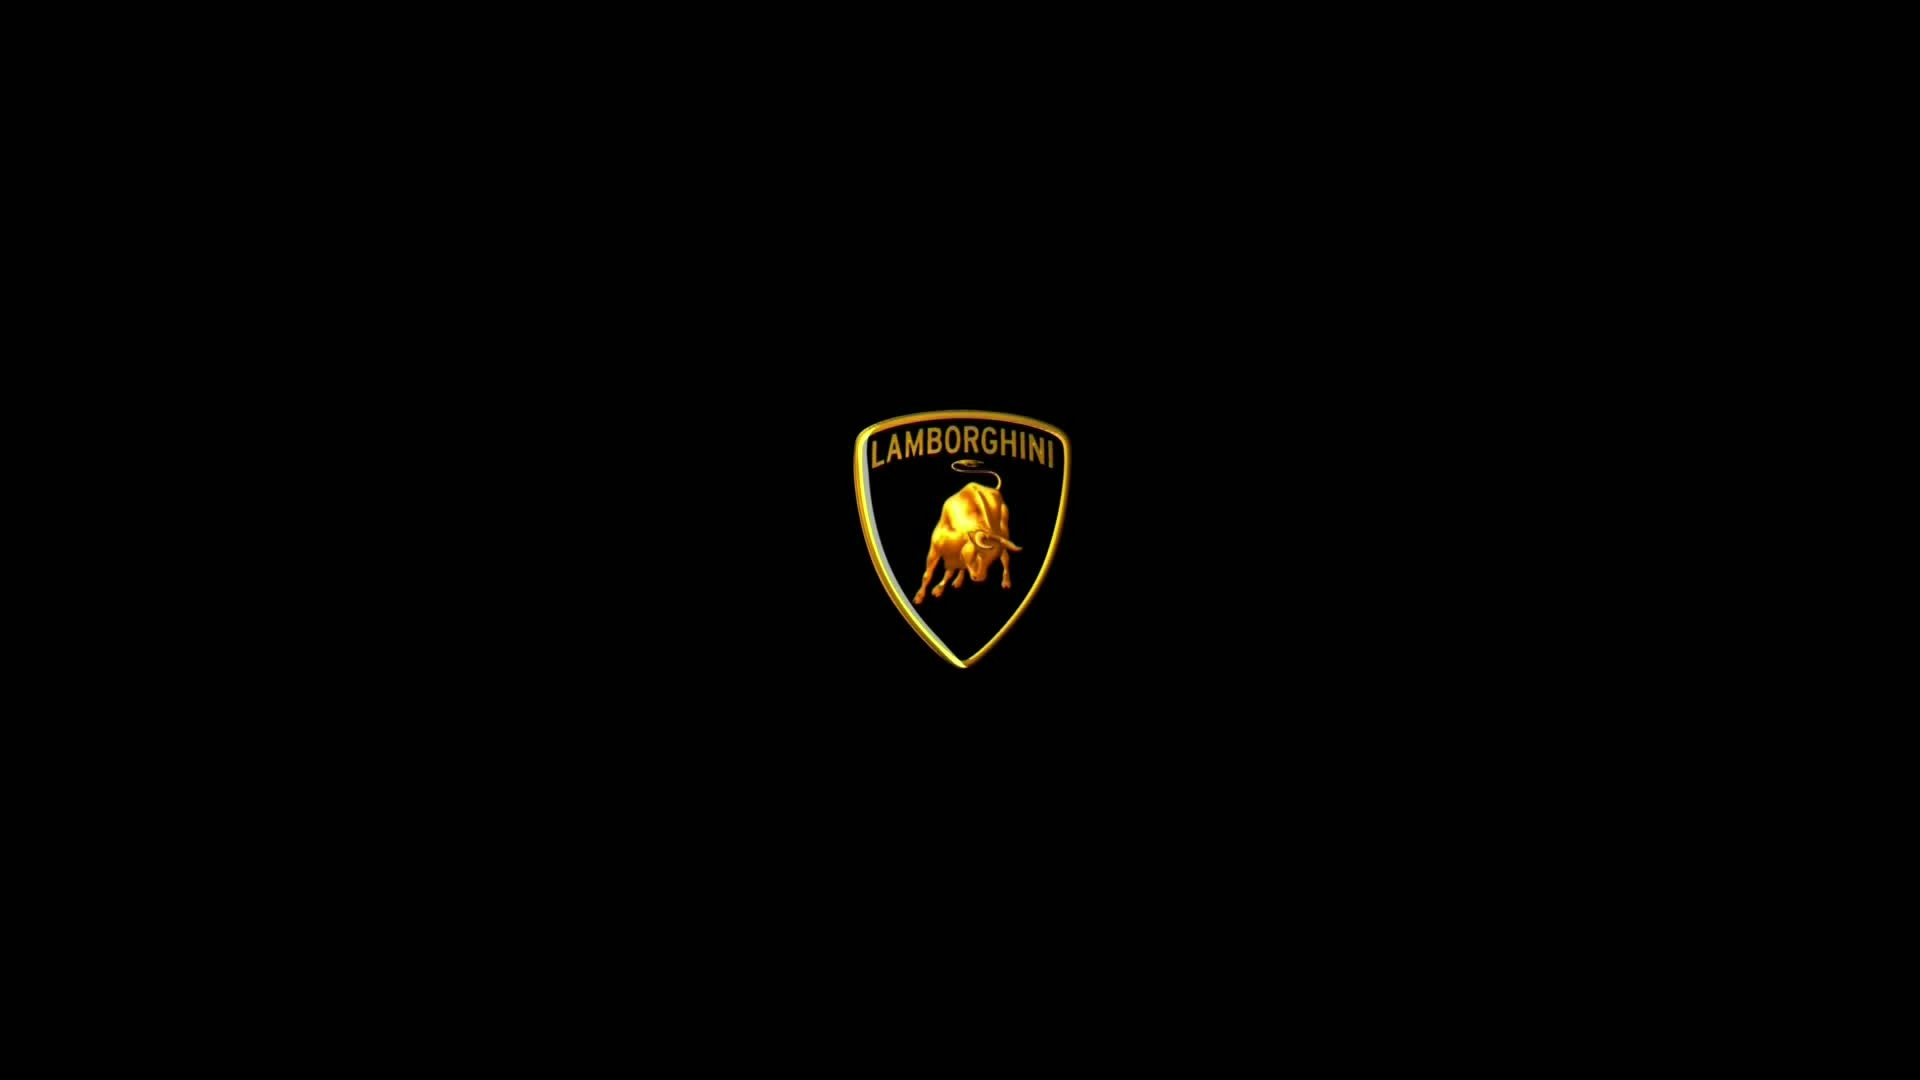 Lamborghini Logo Cool HD Wallpapers | HD Wallpapers